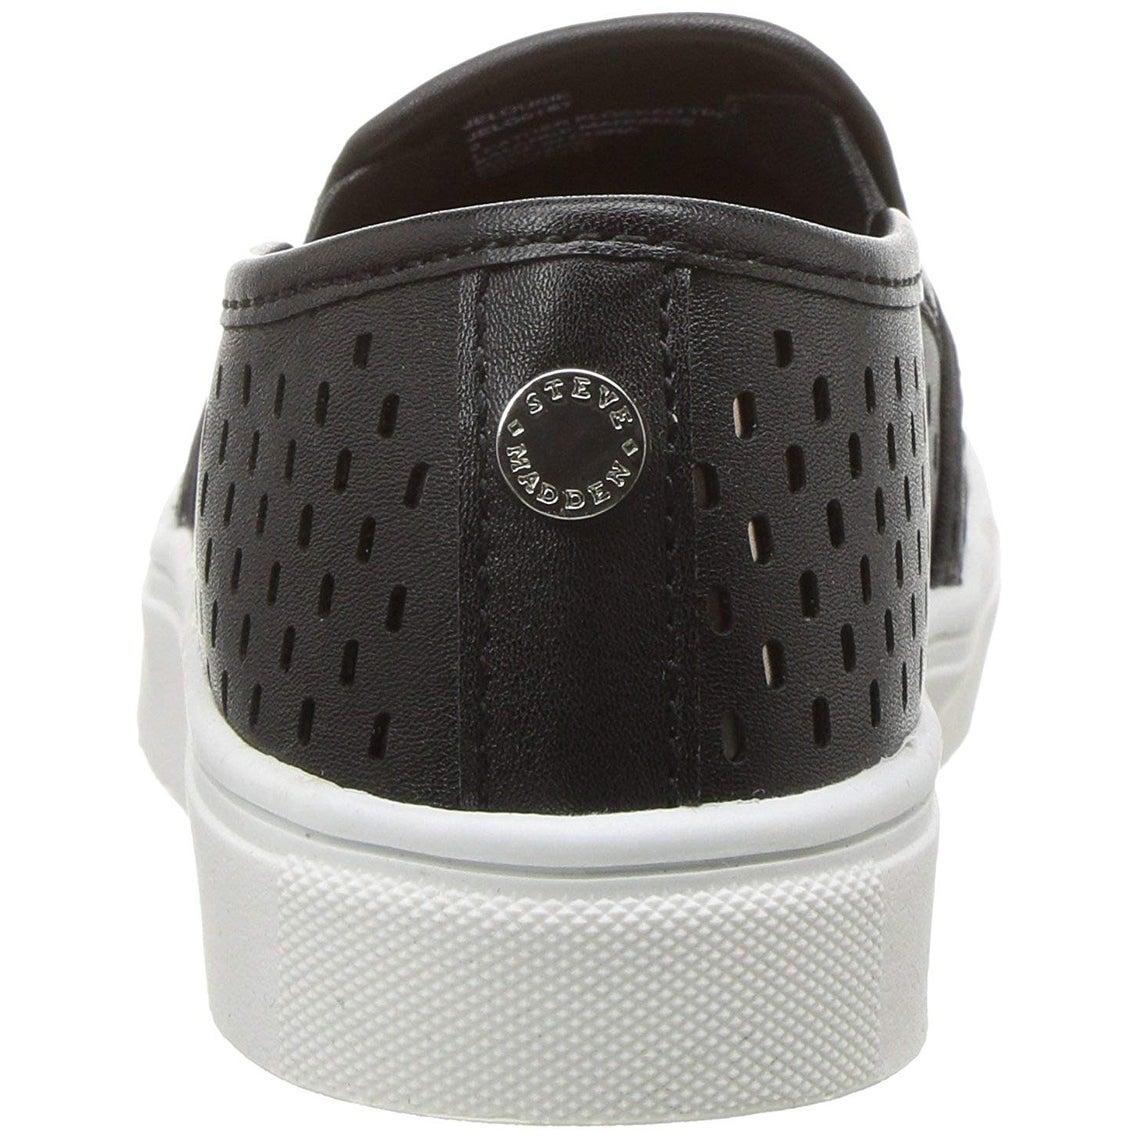 310a006d011 Kids Steve Madden Girls Jelouise Leather Low Top Slip On Fashion Sneaker